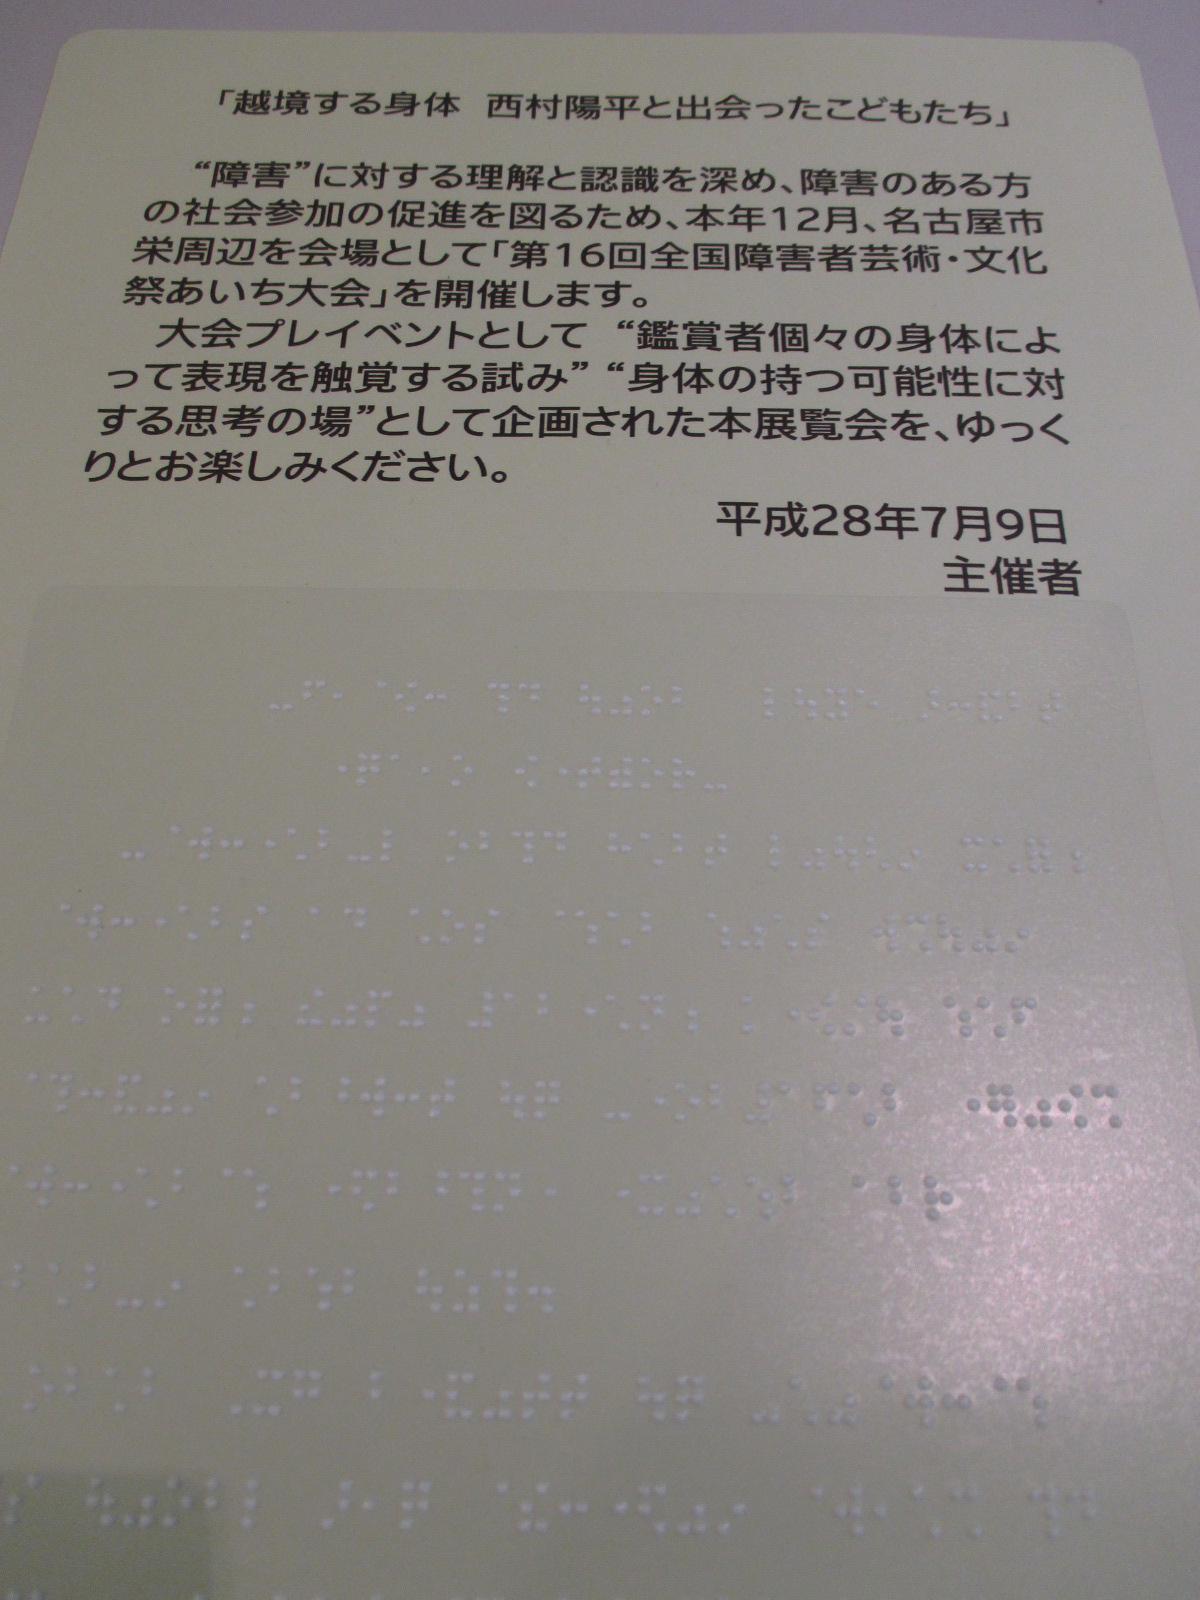 1607011_nishimura_shoukai_05